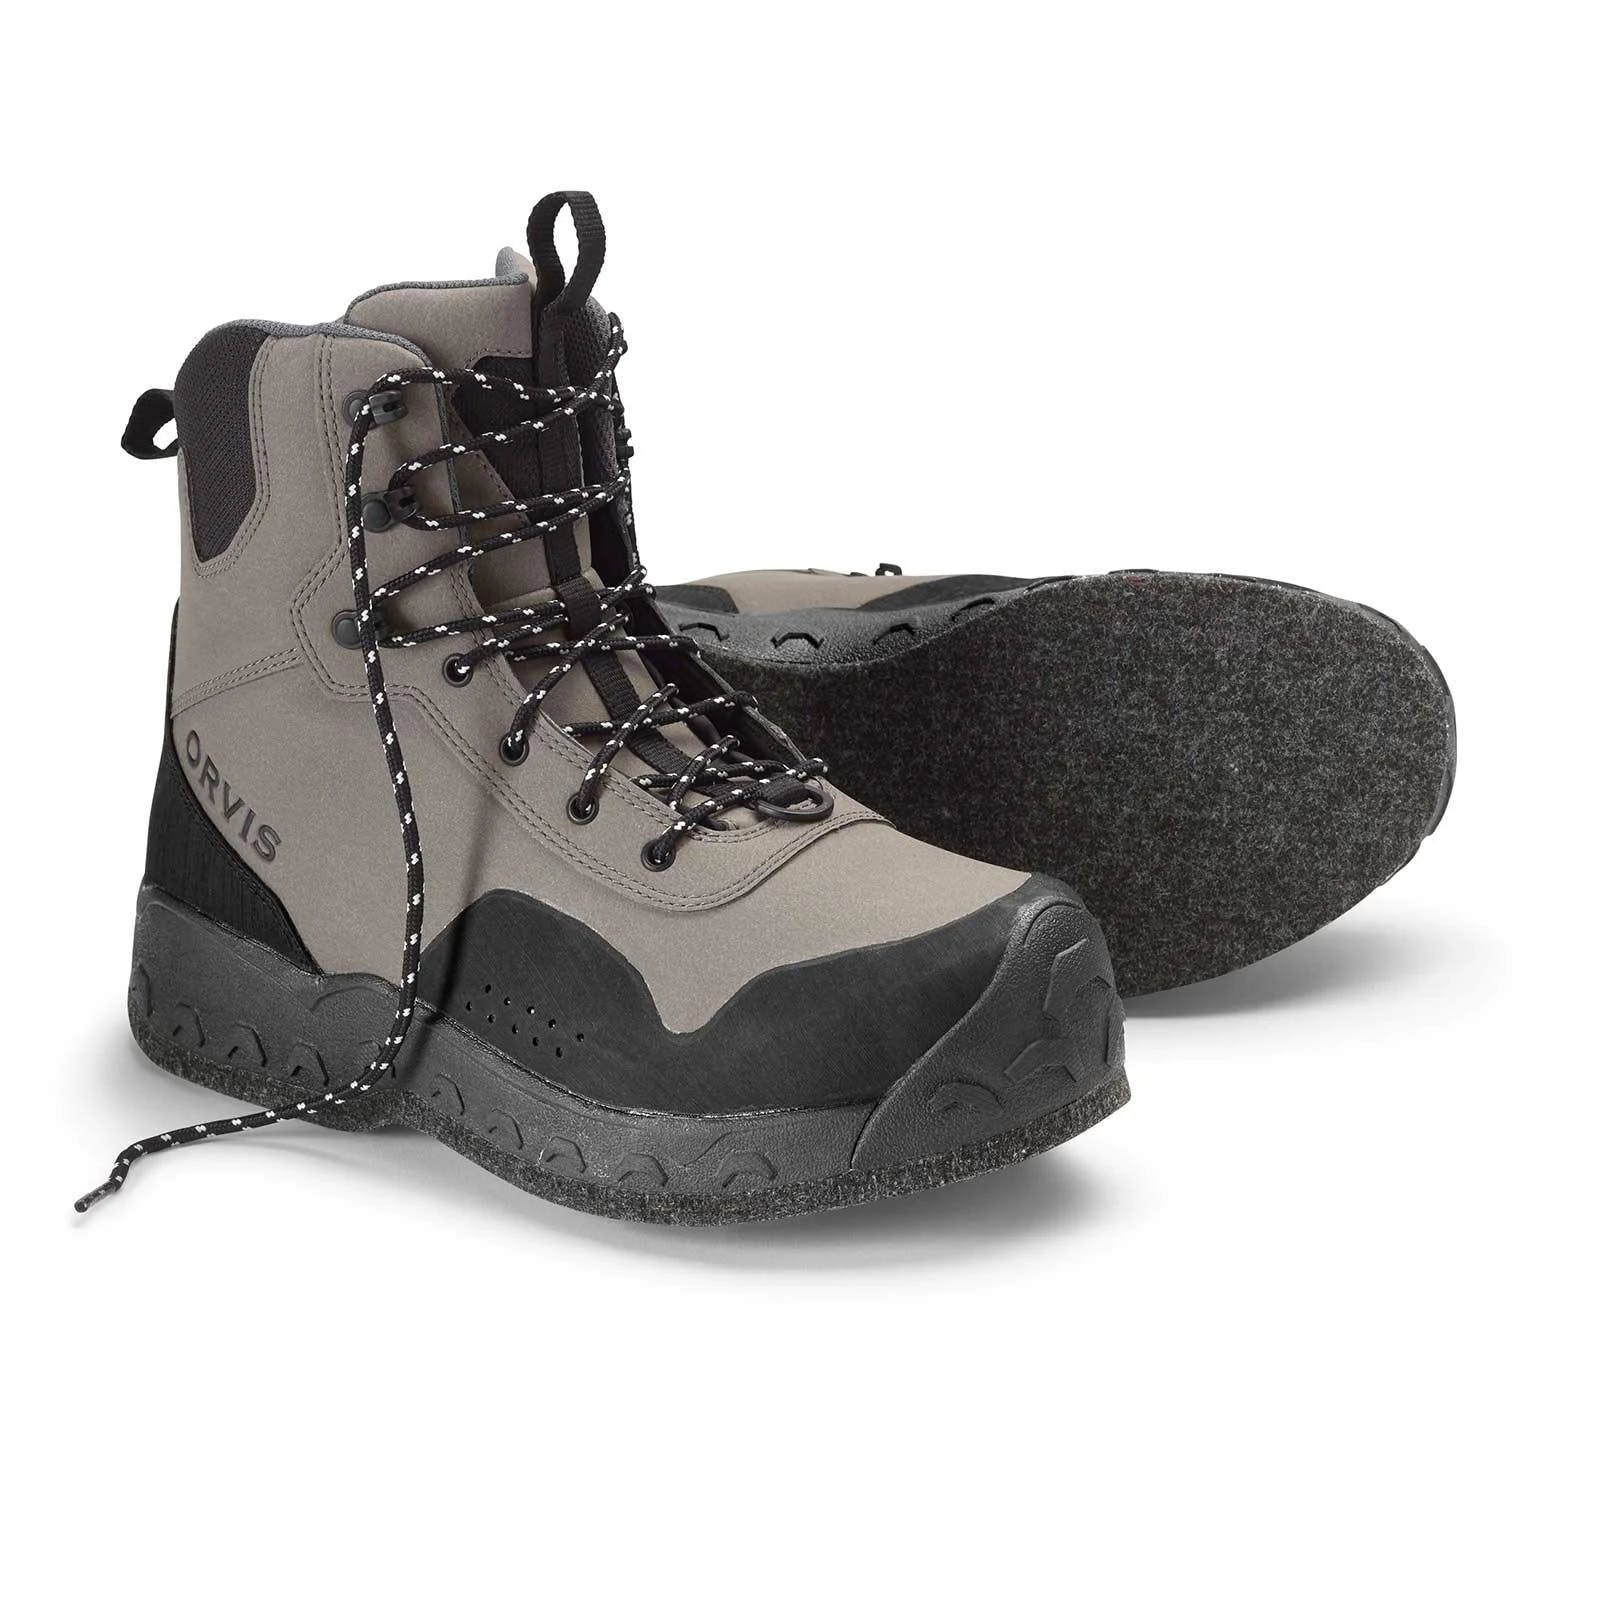 Orvis Men's Clearwater Wading Boots 10; Gravel; Felt Sole